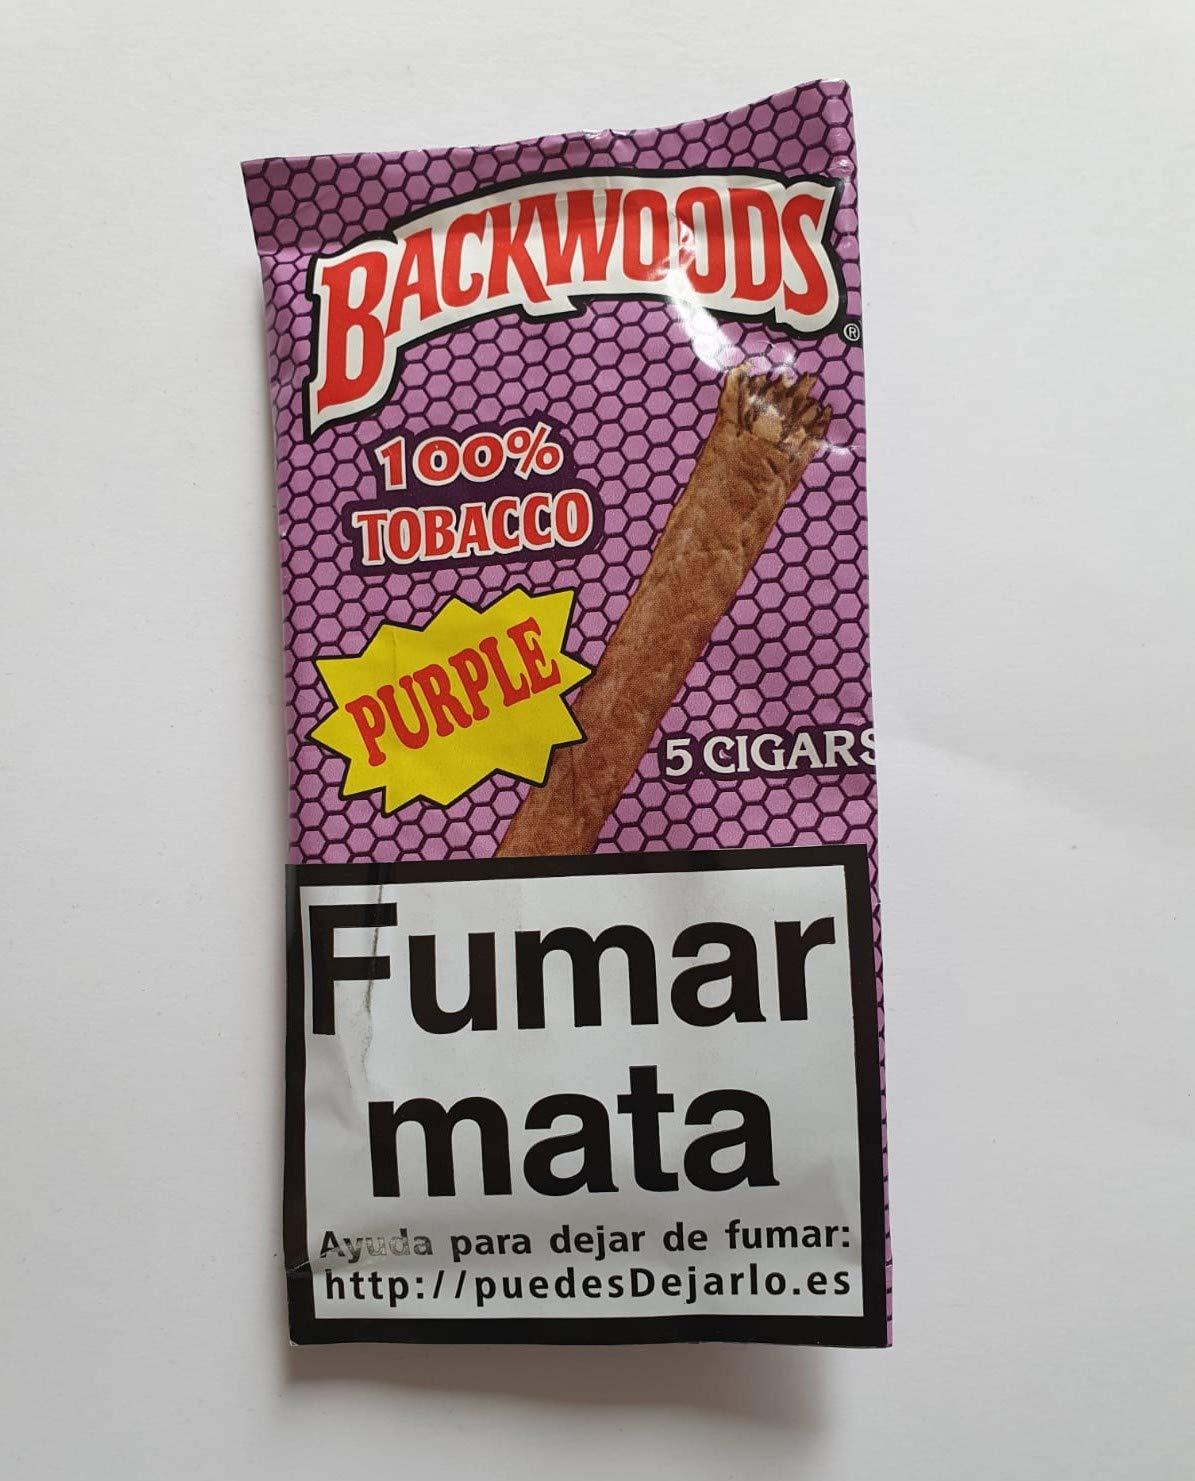 Blunt BACKWOODS - Pack 5 Blunts (Purple)